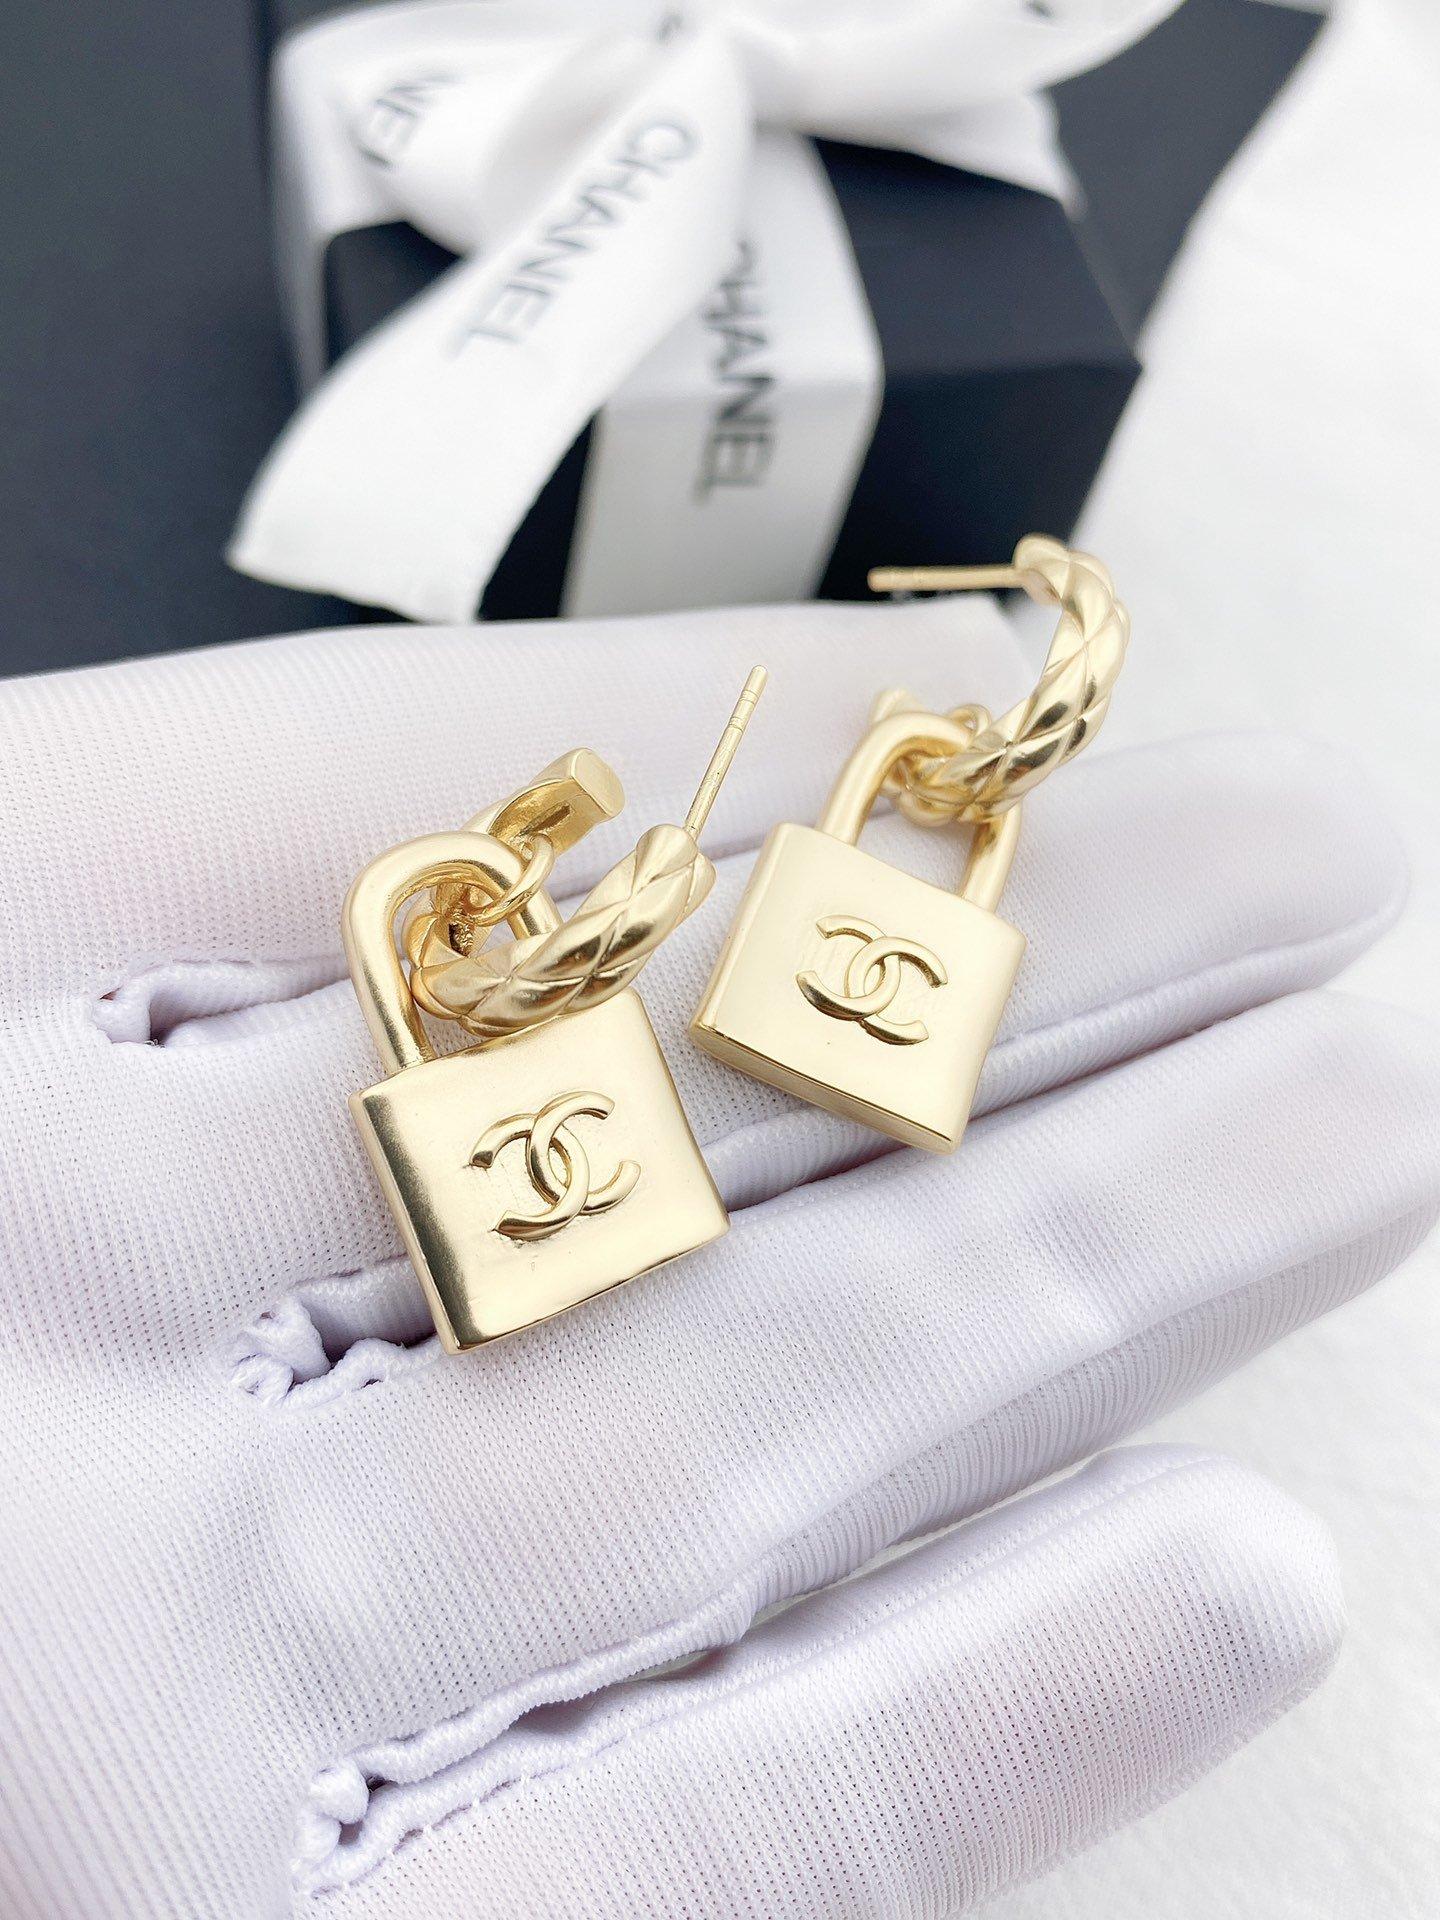 Chanel新款小锁耳环一致黄铜材质